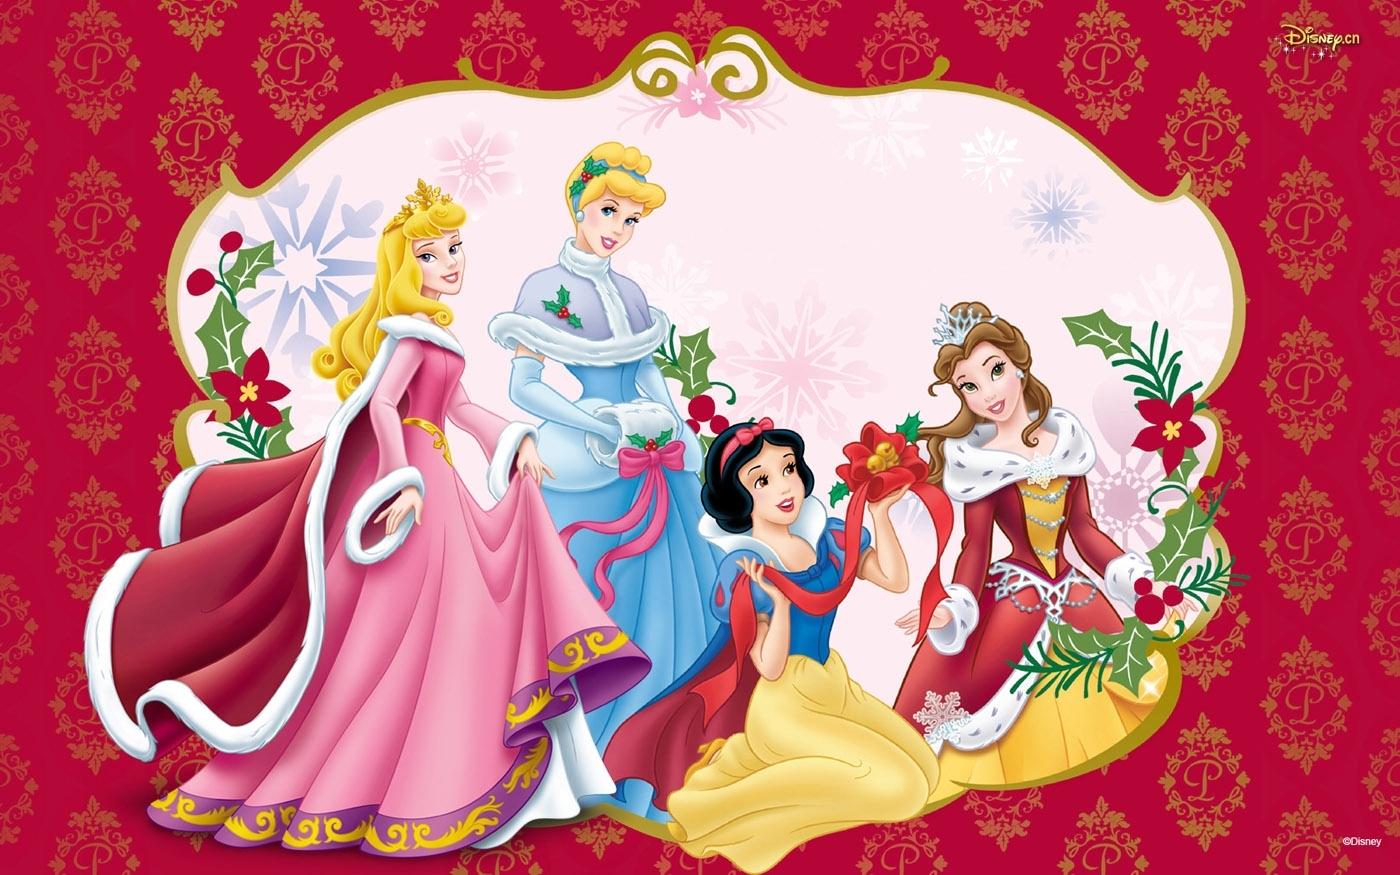 disney princess 24960 - cartoon illustration wallpapers - cartoon